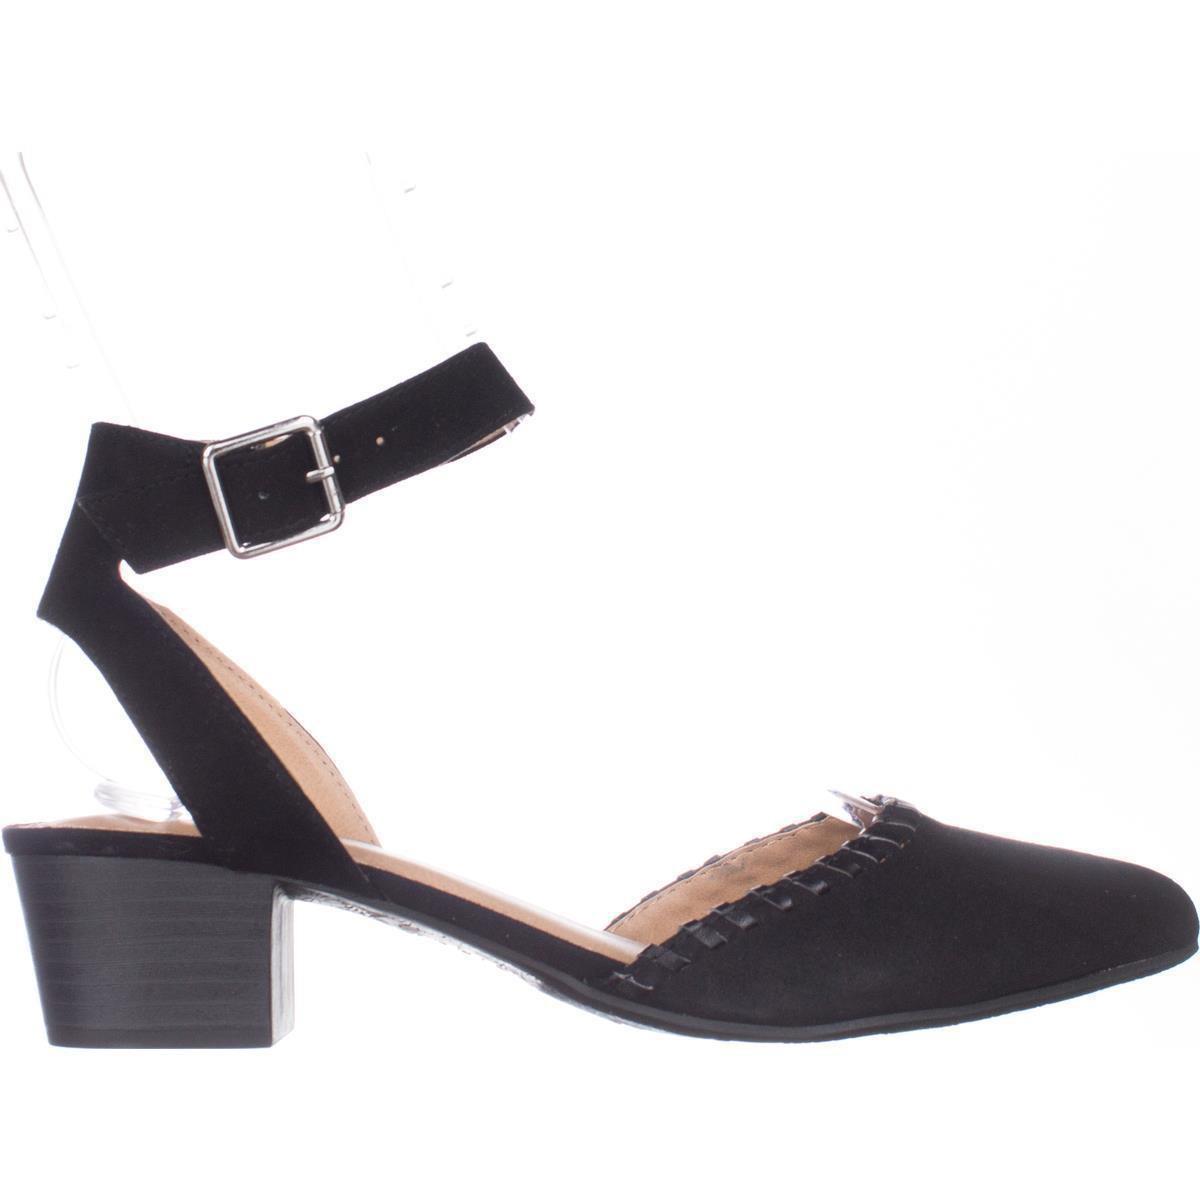 Espirt Saffron Pointed Toe Ankle Strap Block Heel Pumps